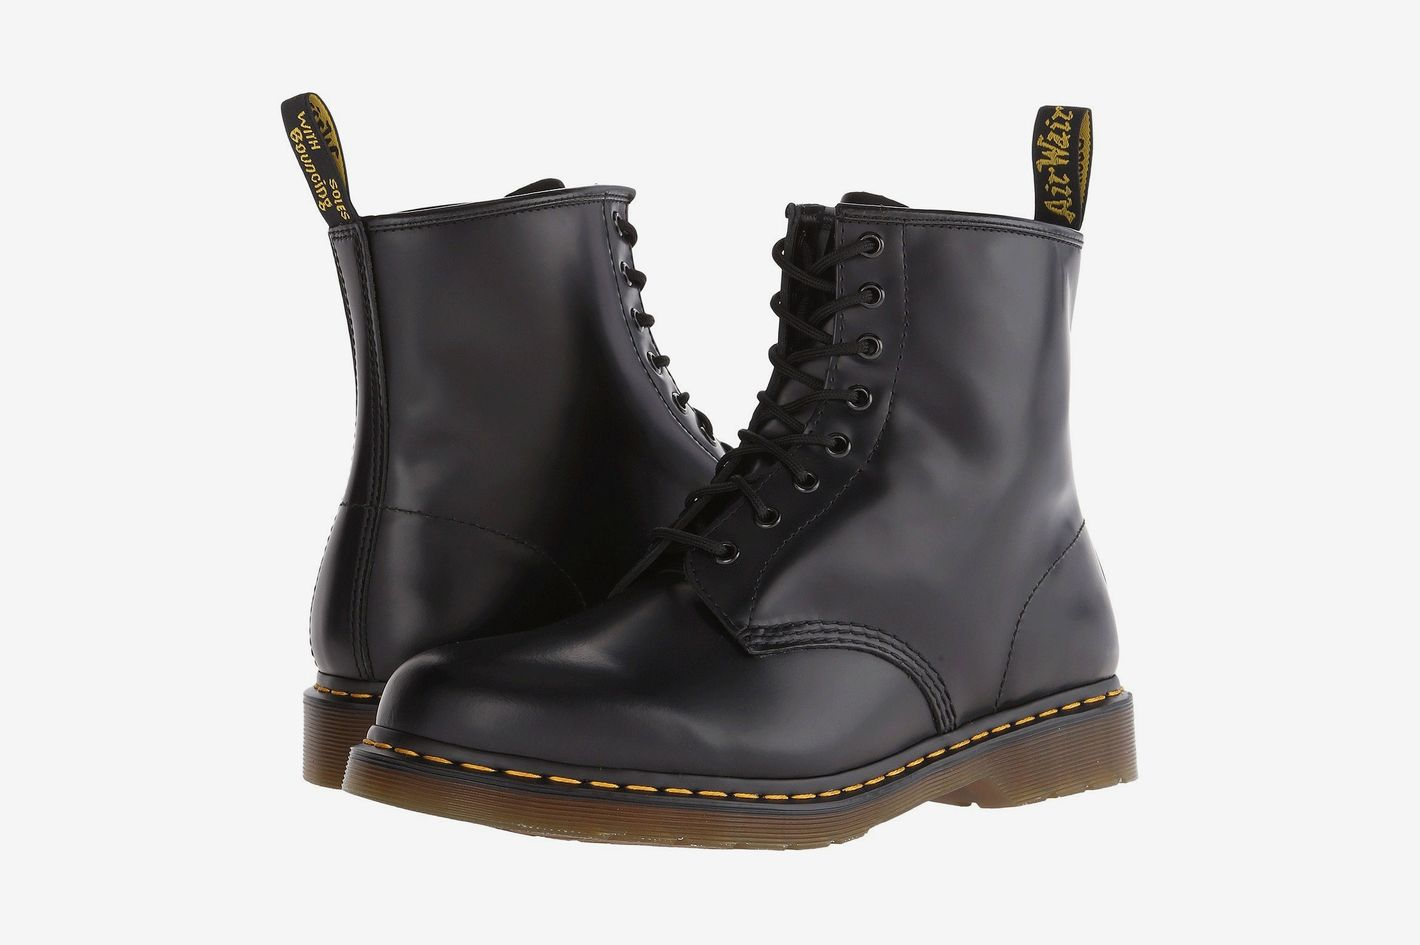 1b4e4246692aa 11 Best Men's Combat Boots for Stylish Men 2018